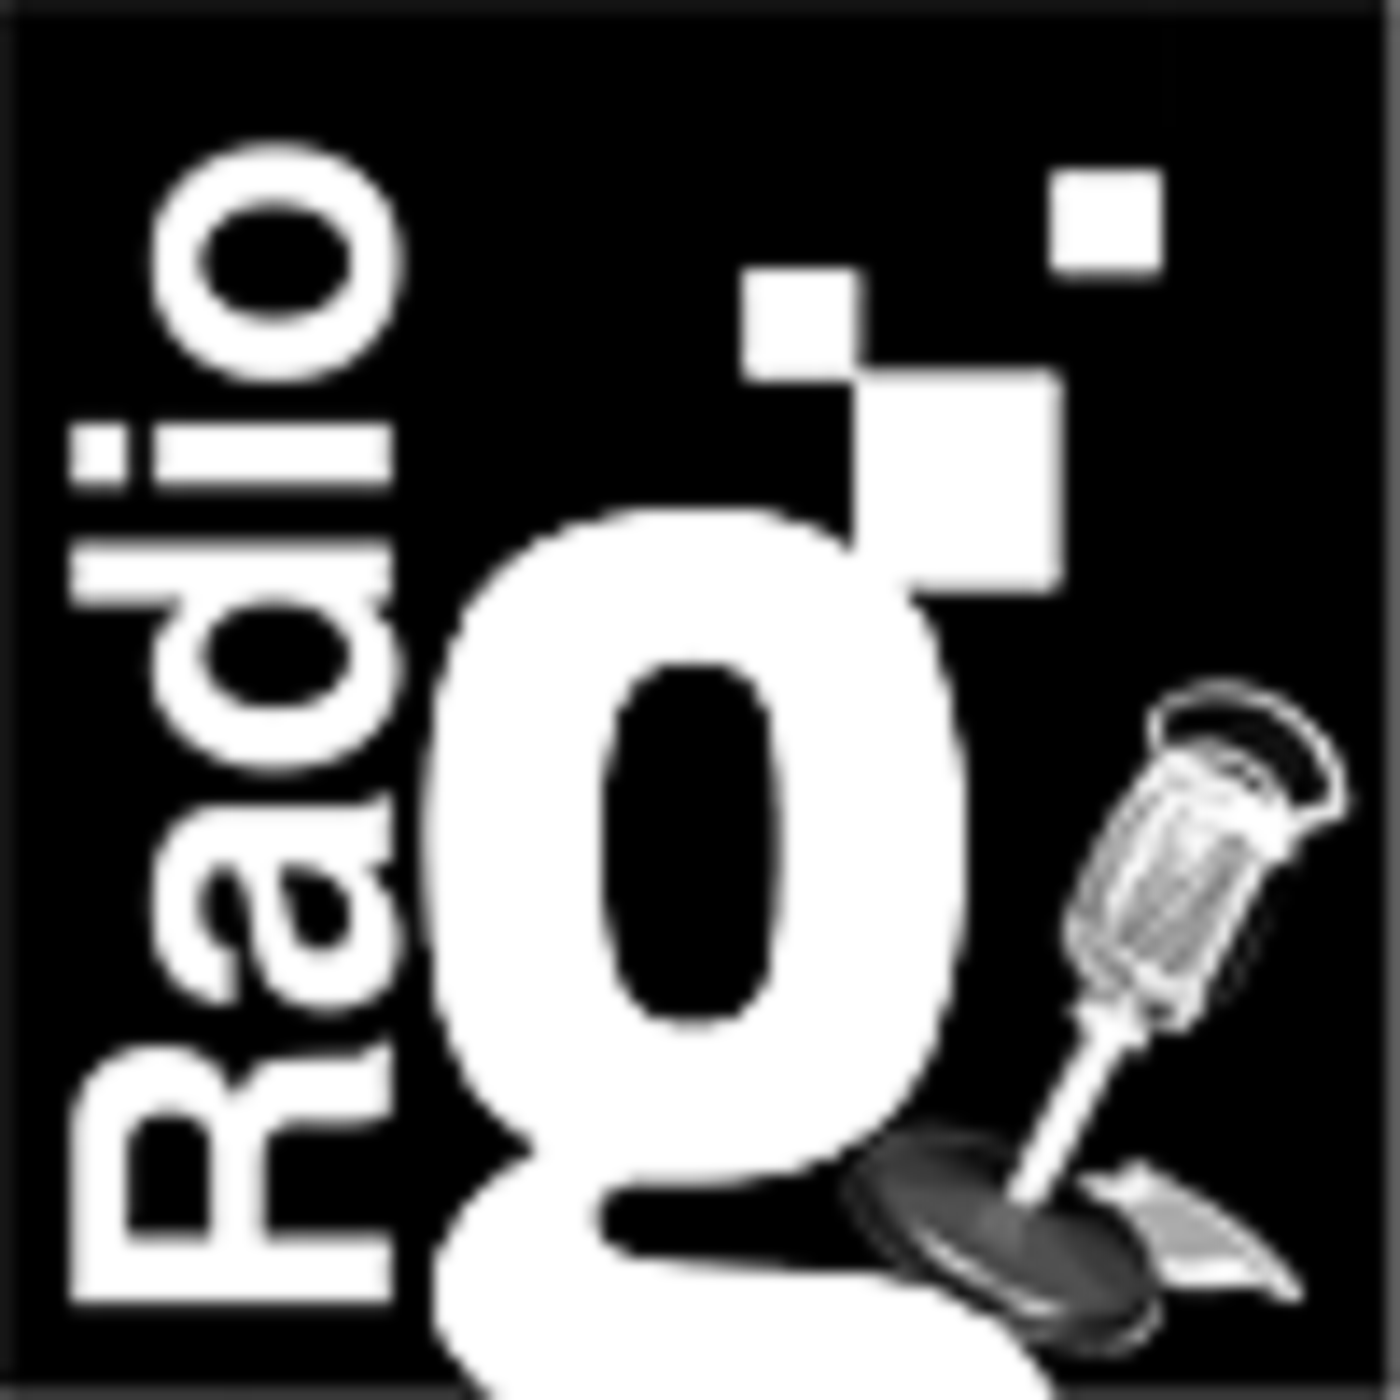 Guadalinfo Radio Benamaurel